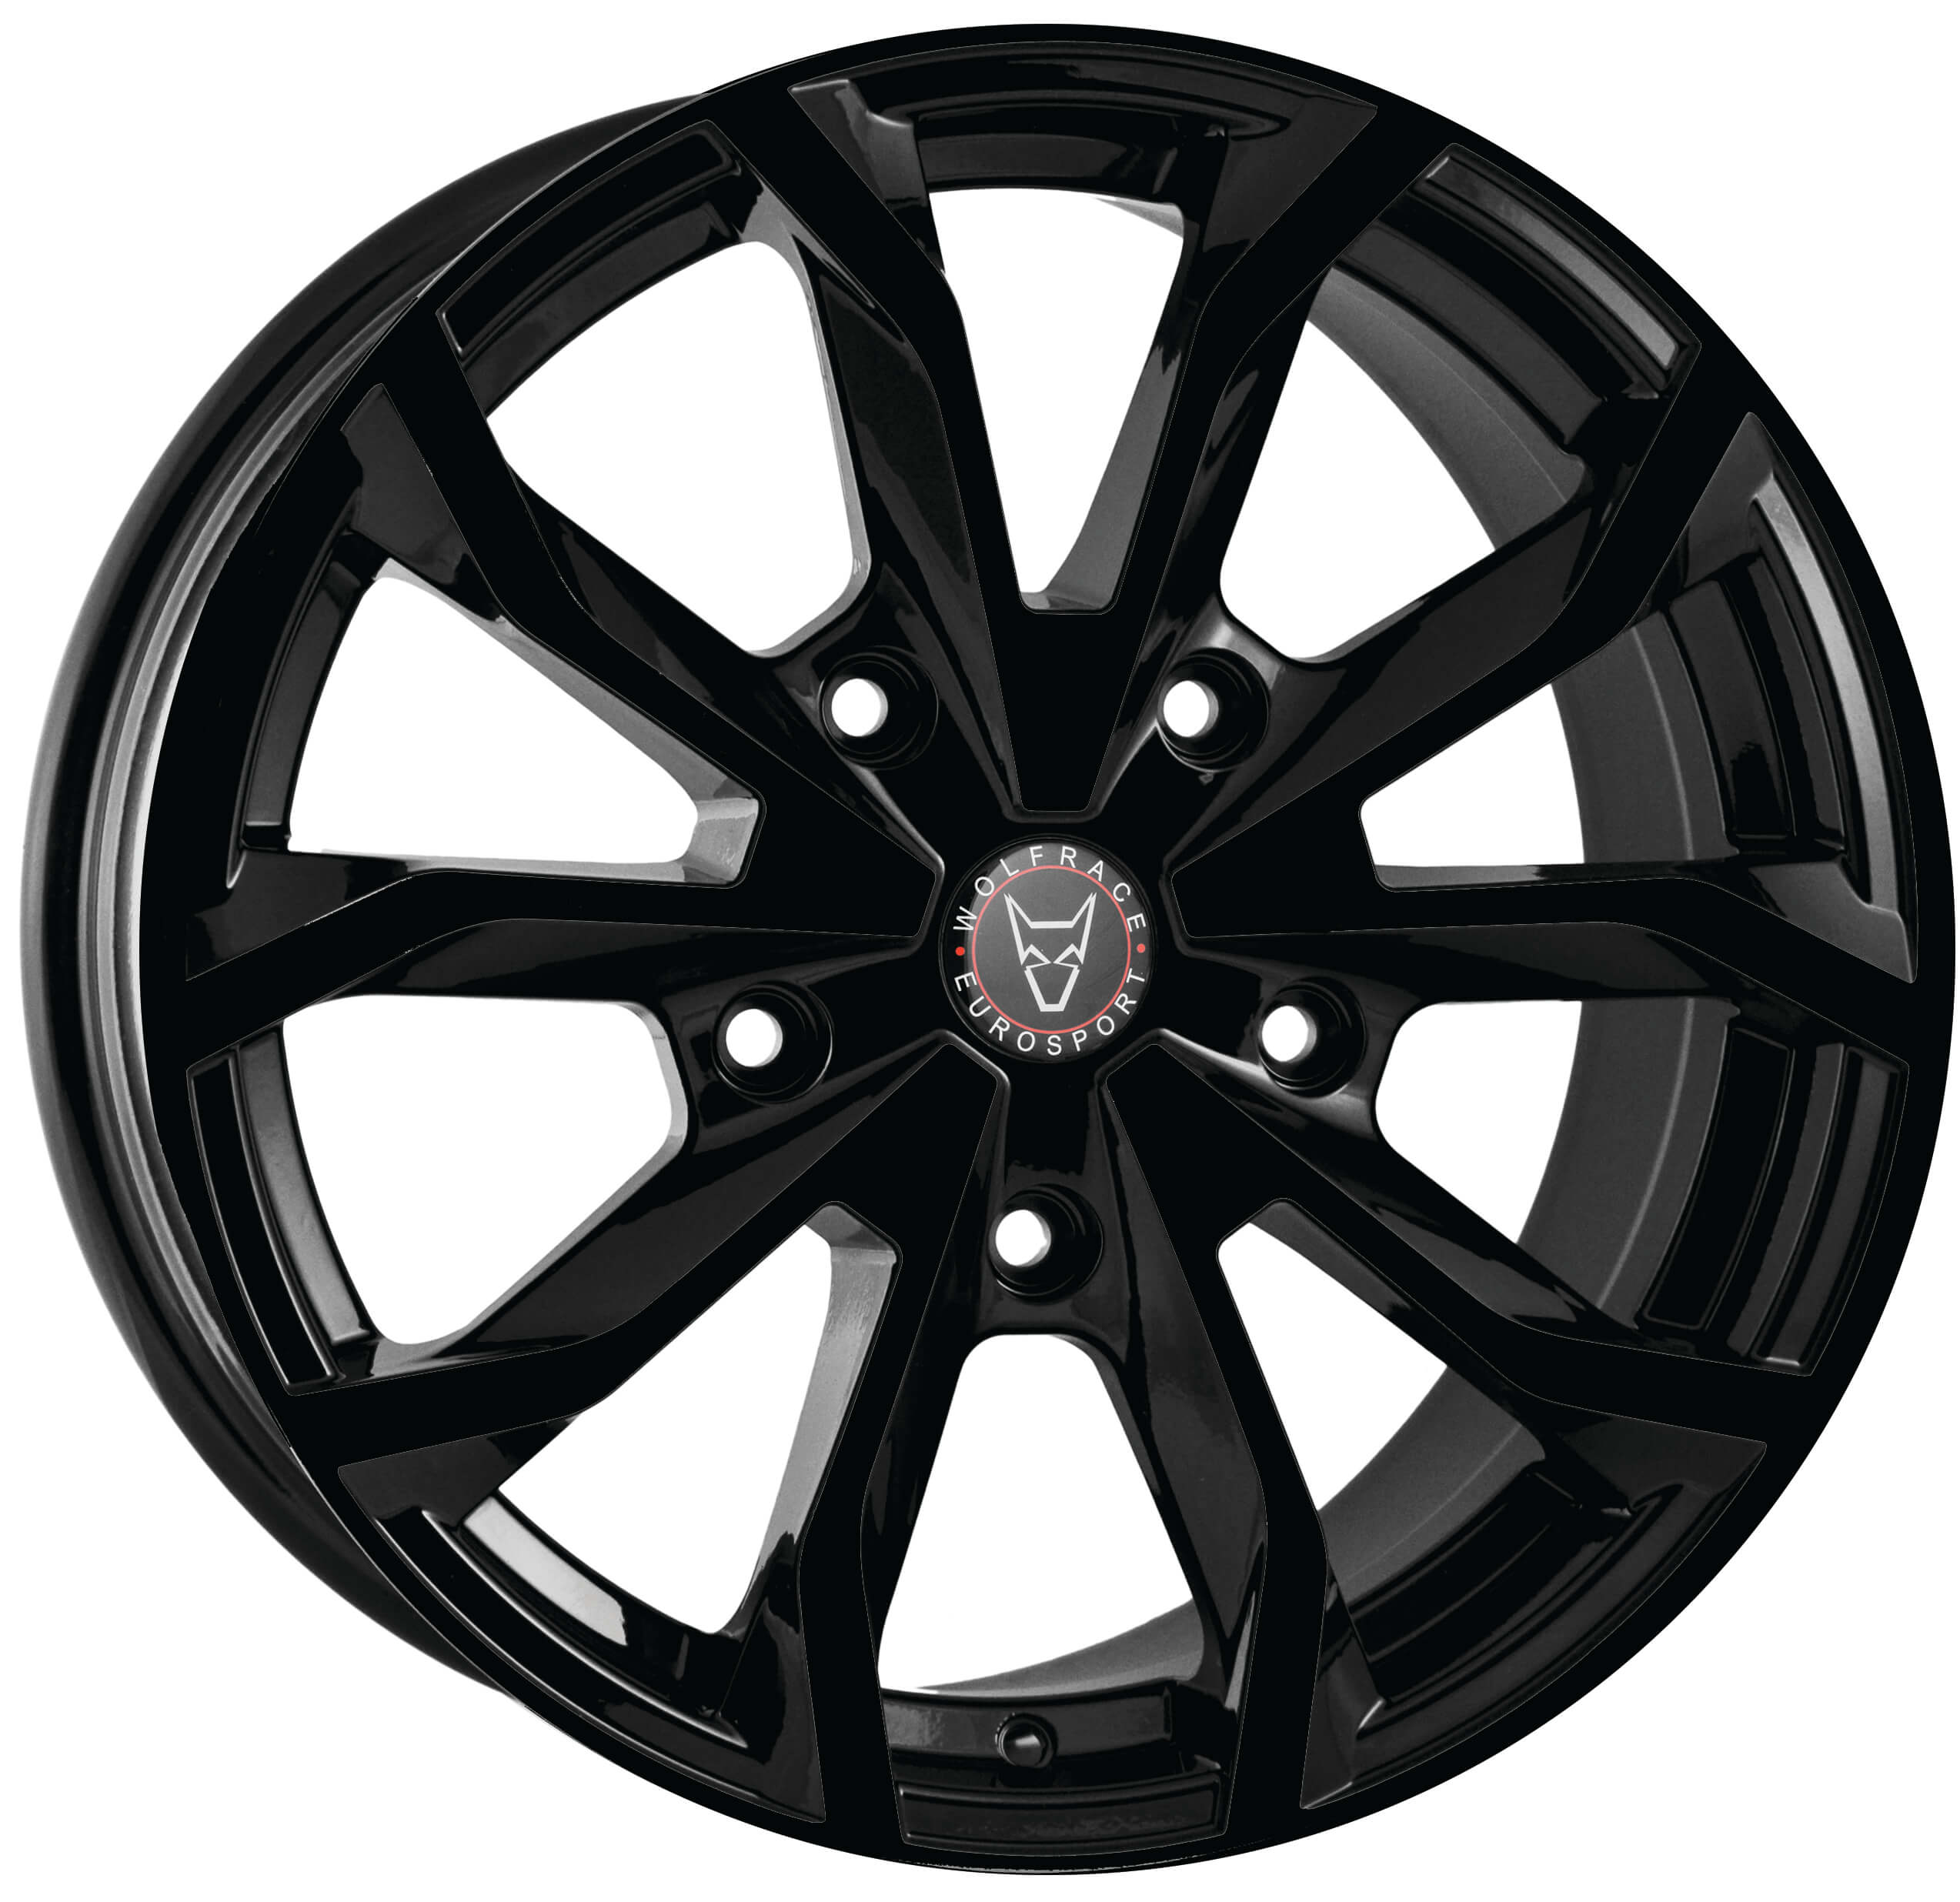 Wolfrace Eurosport - Assassin TRS (Gloss Black)